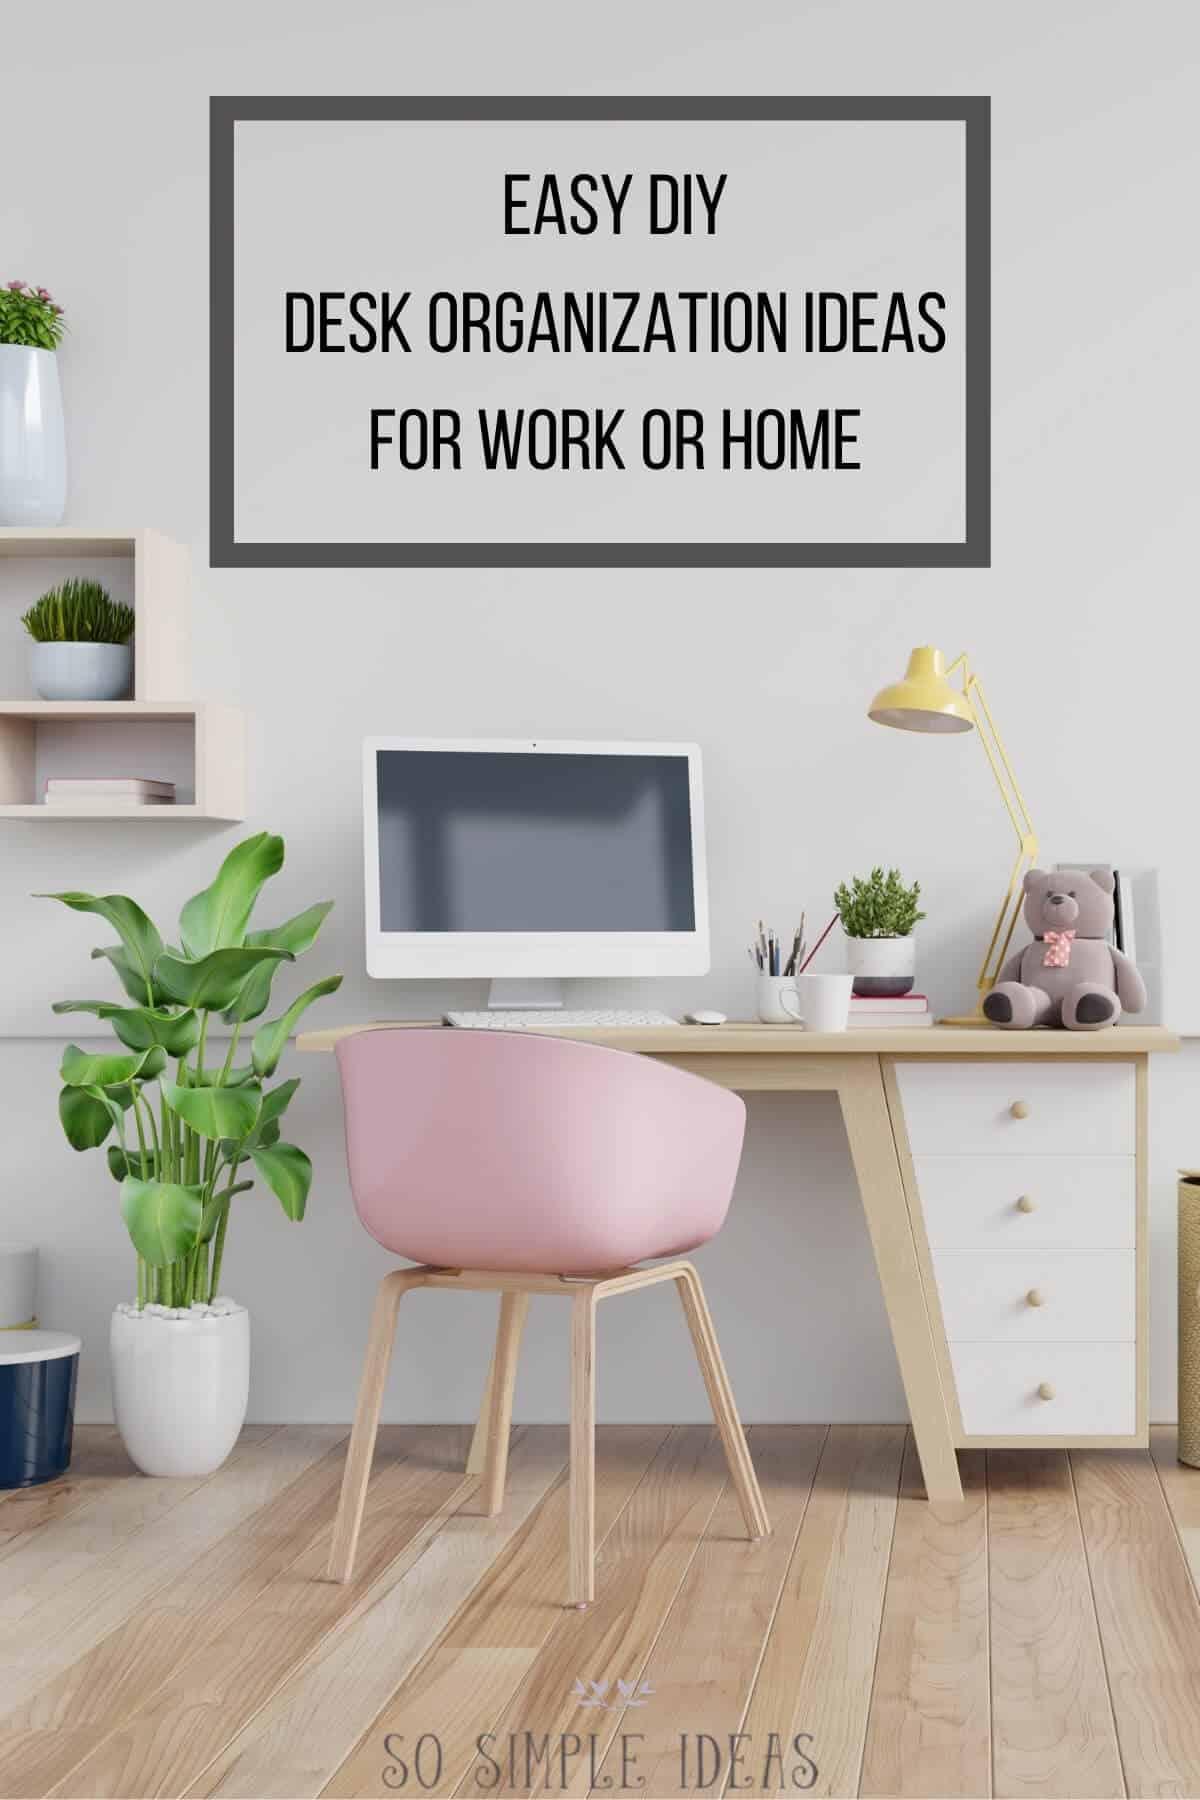 easy diy desk organization ideas cover image